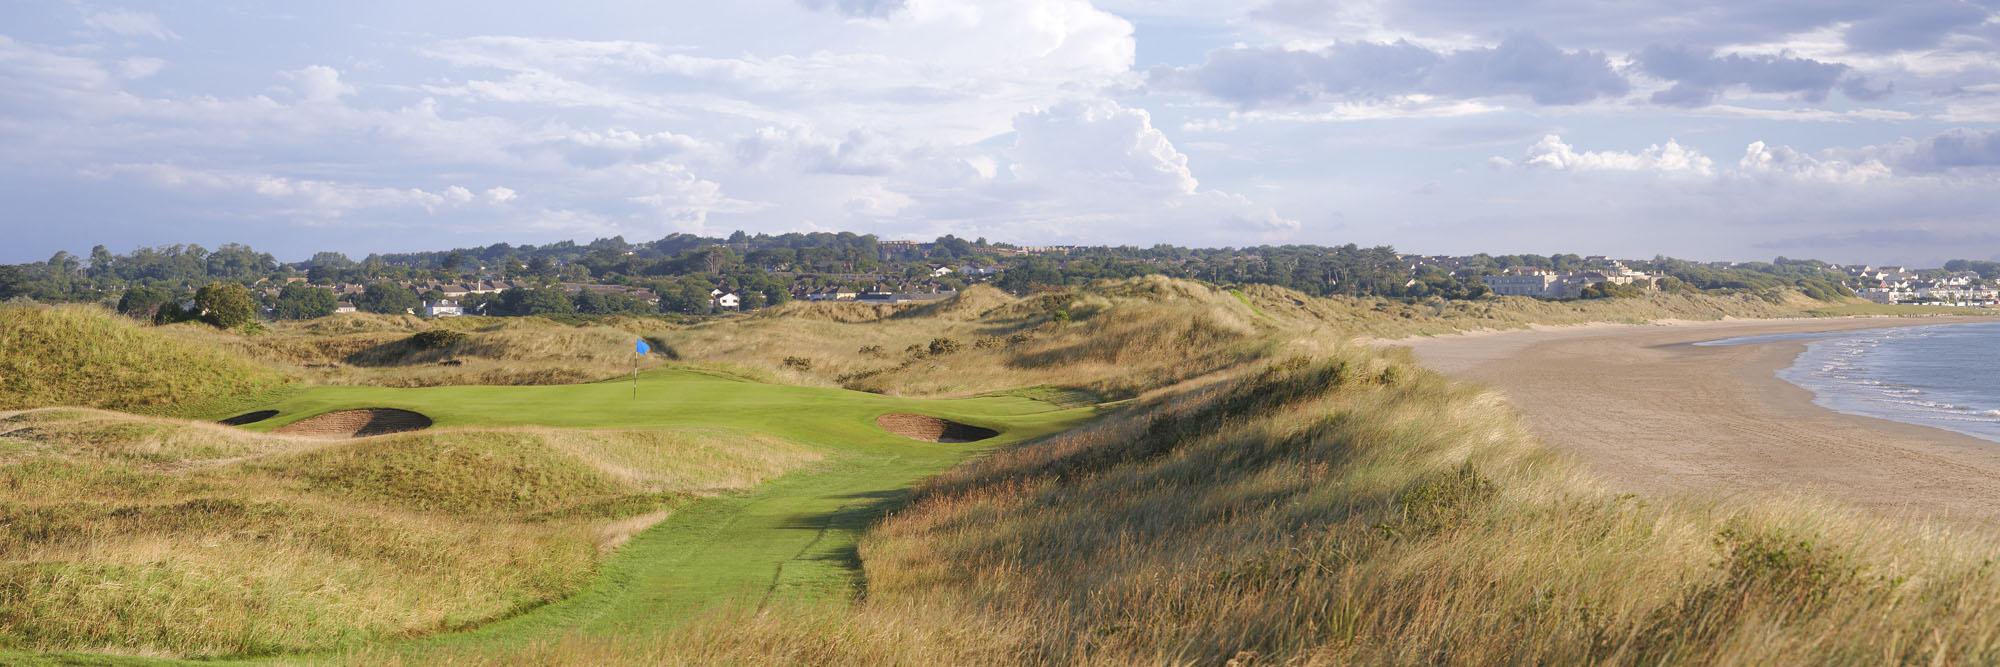 Golf Course Image - Portmarnock No. 15